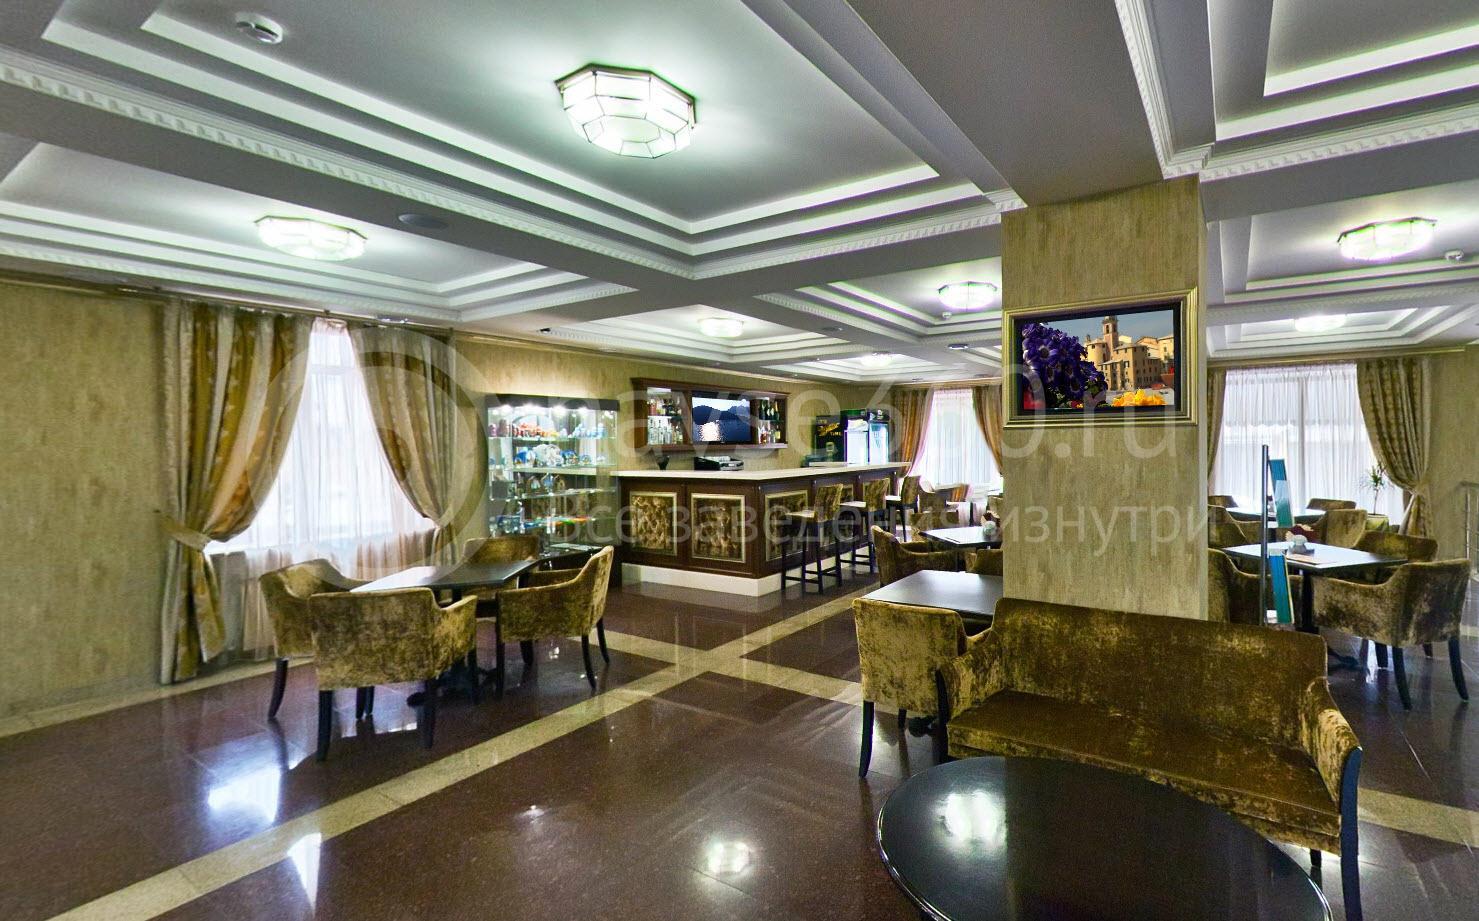 Гостиница Мальдини, Краснодар, ресепшн